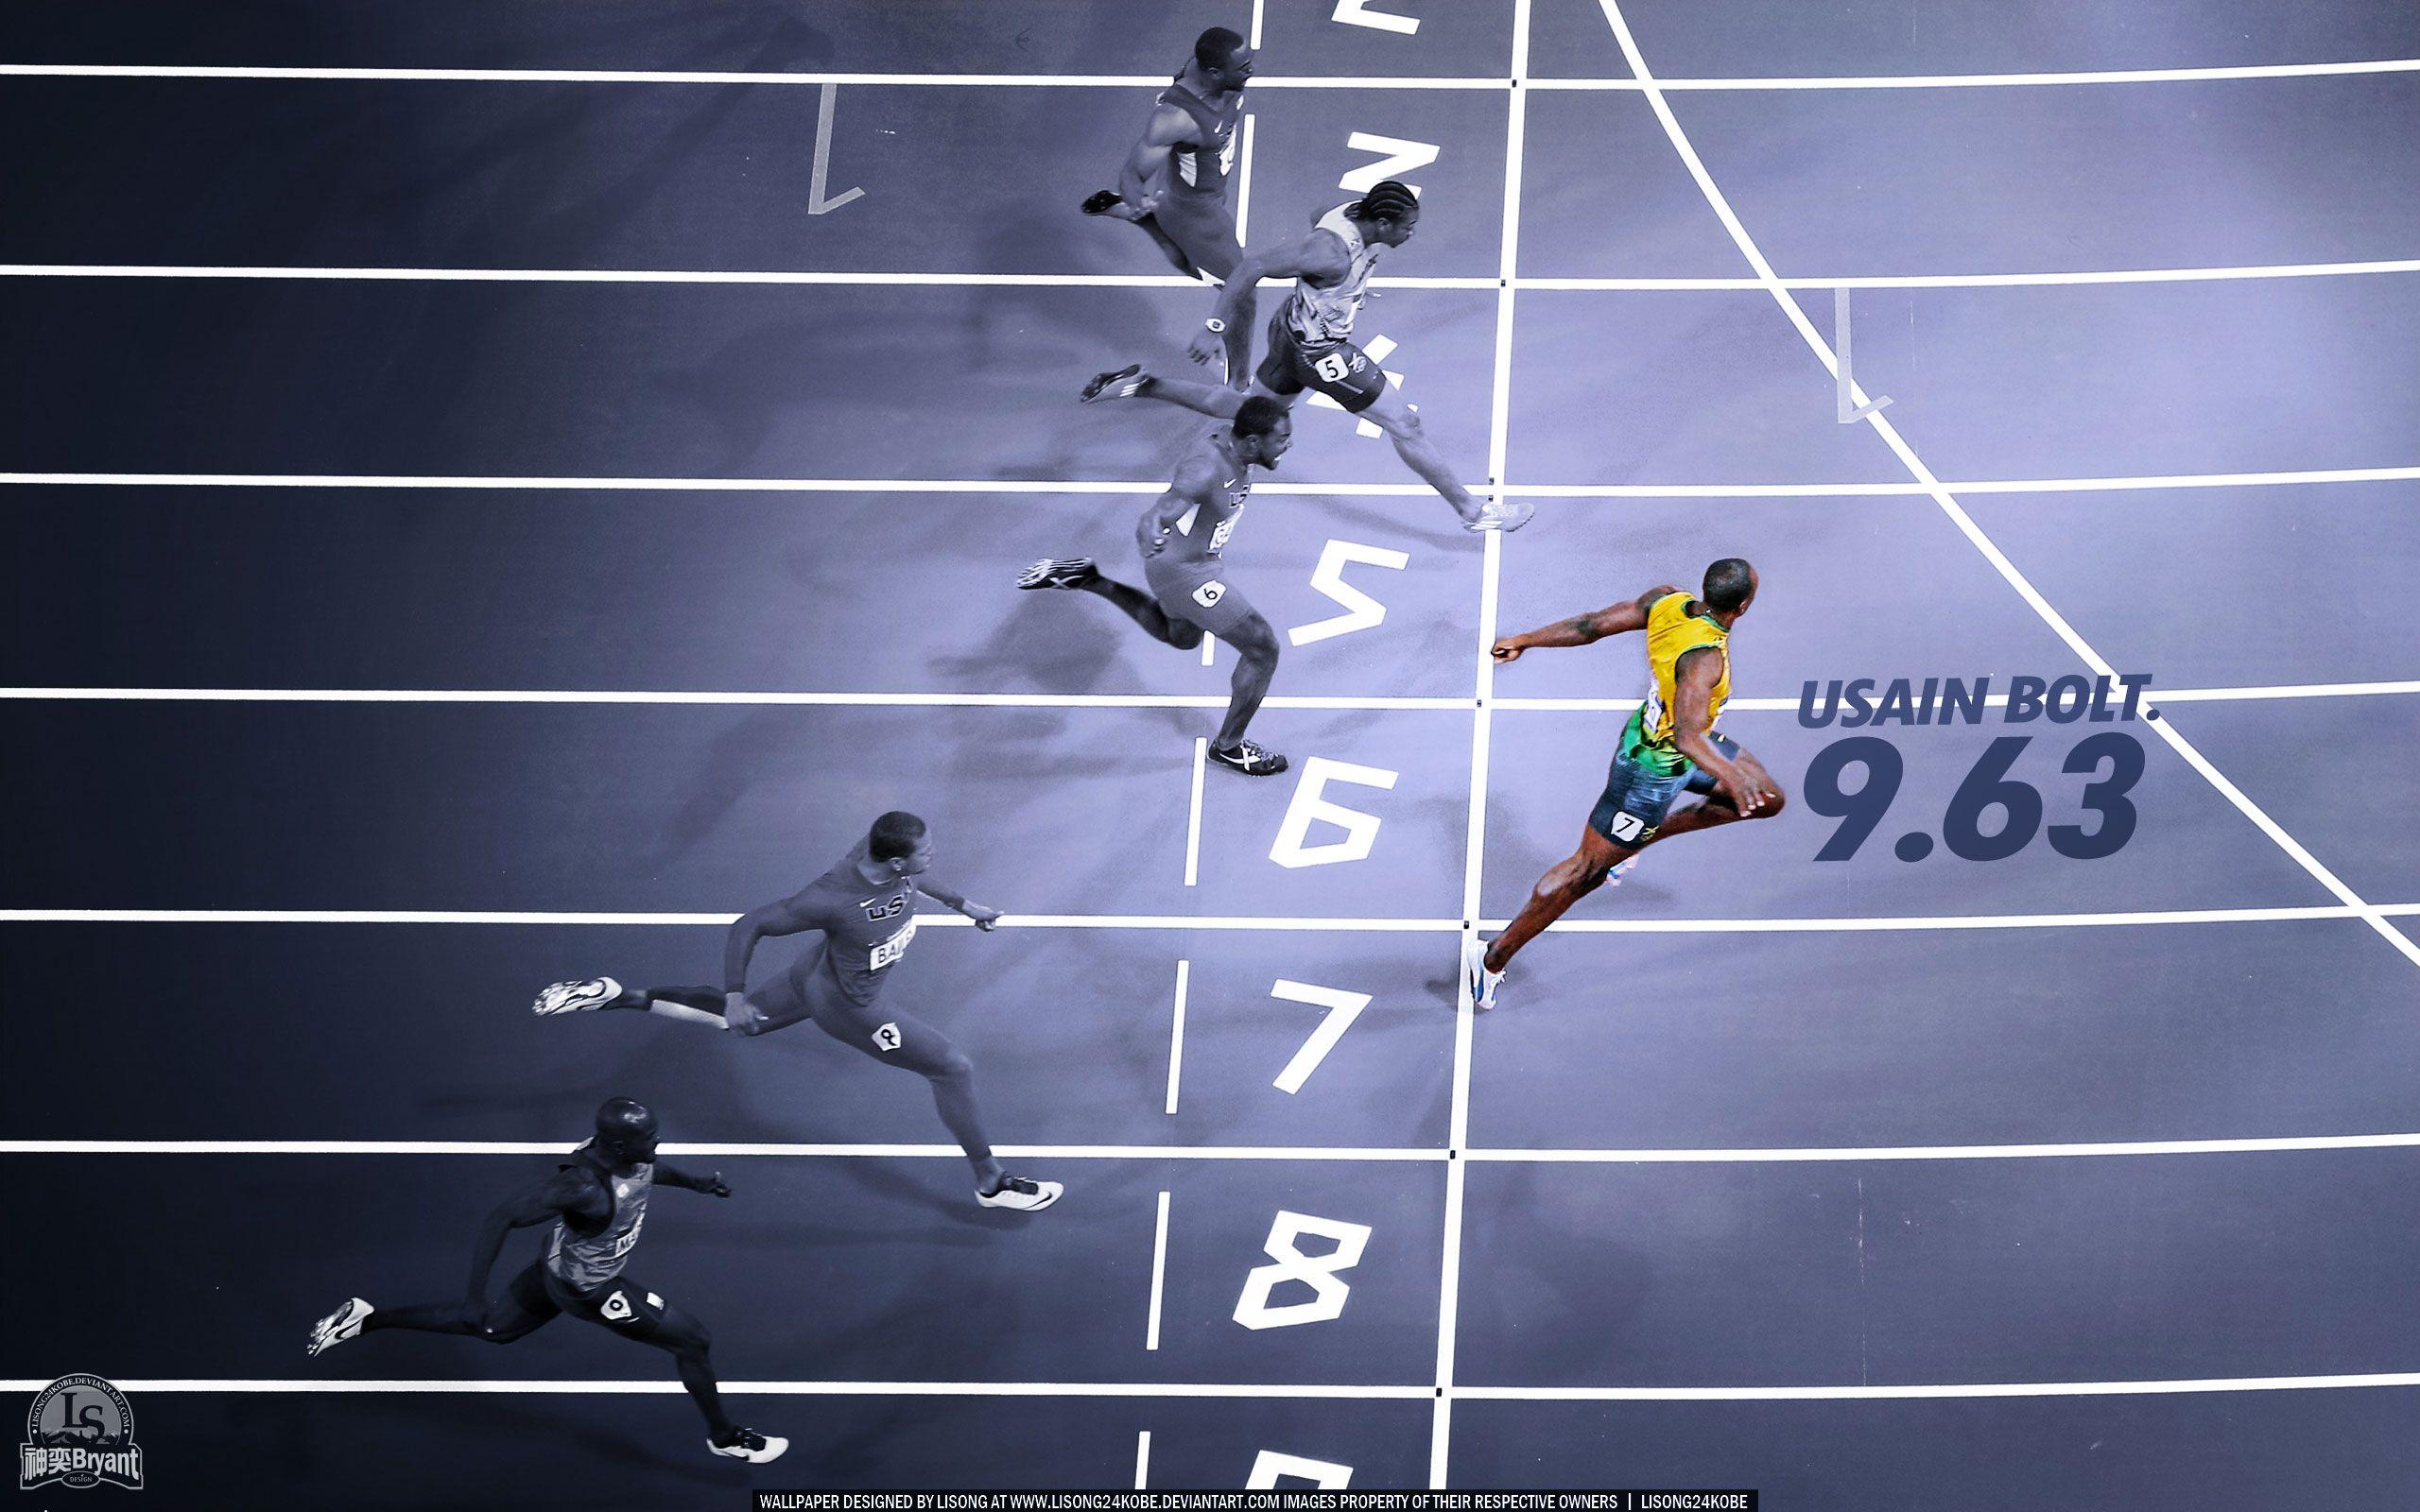 Free Wallpapers - Usain Bolt 2012 Olympics Record 2560x1600 wallpaper